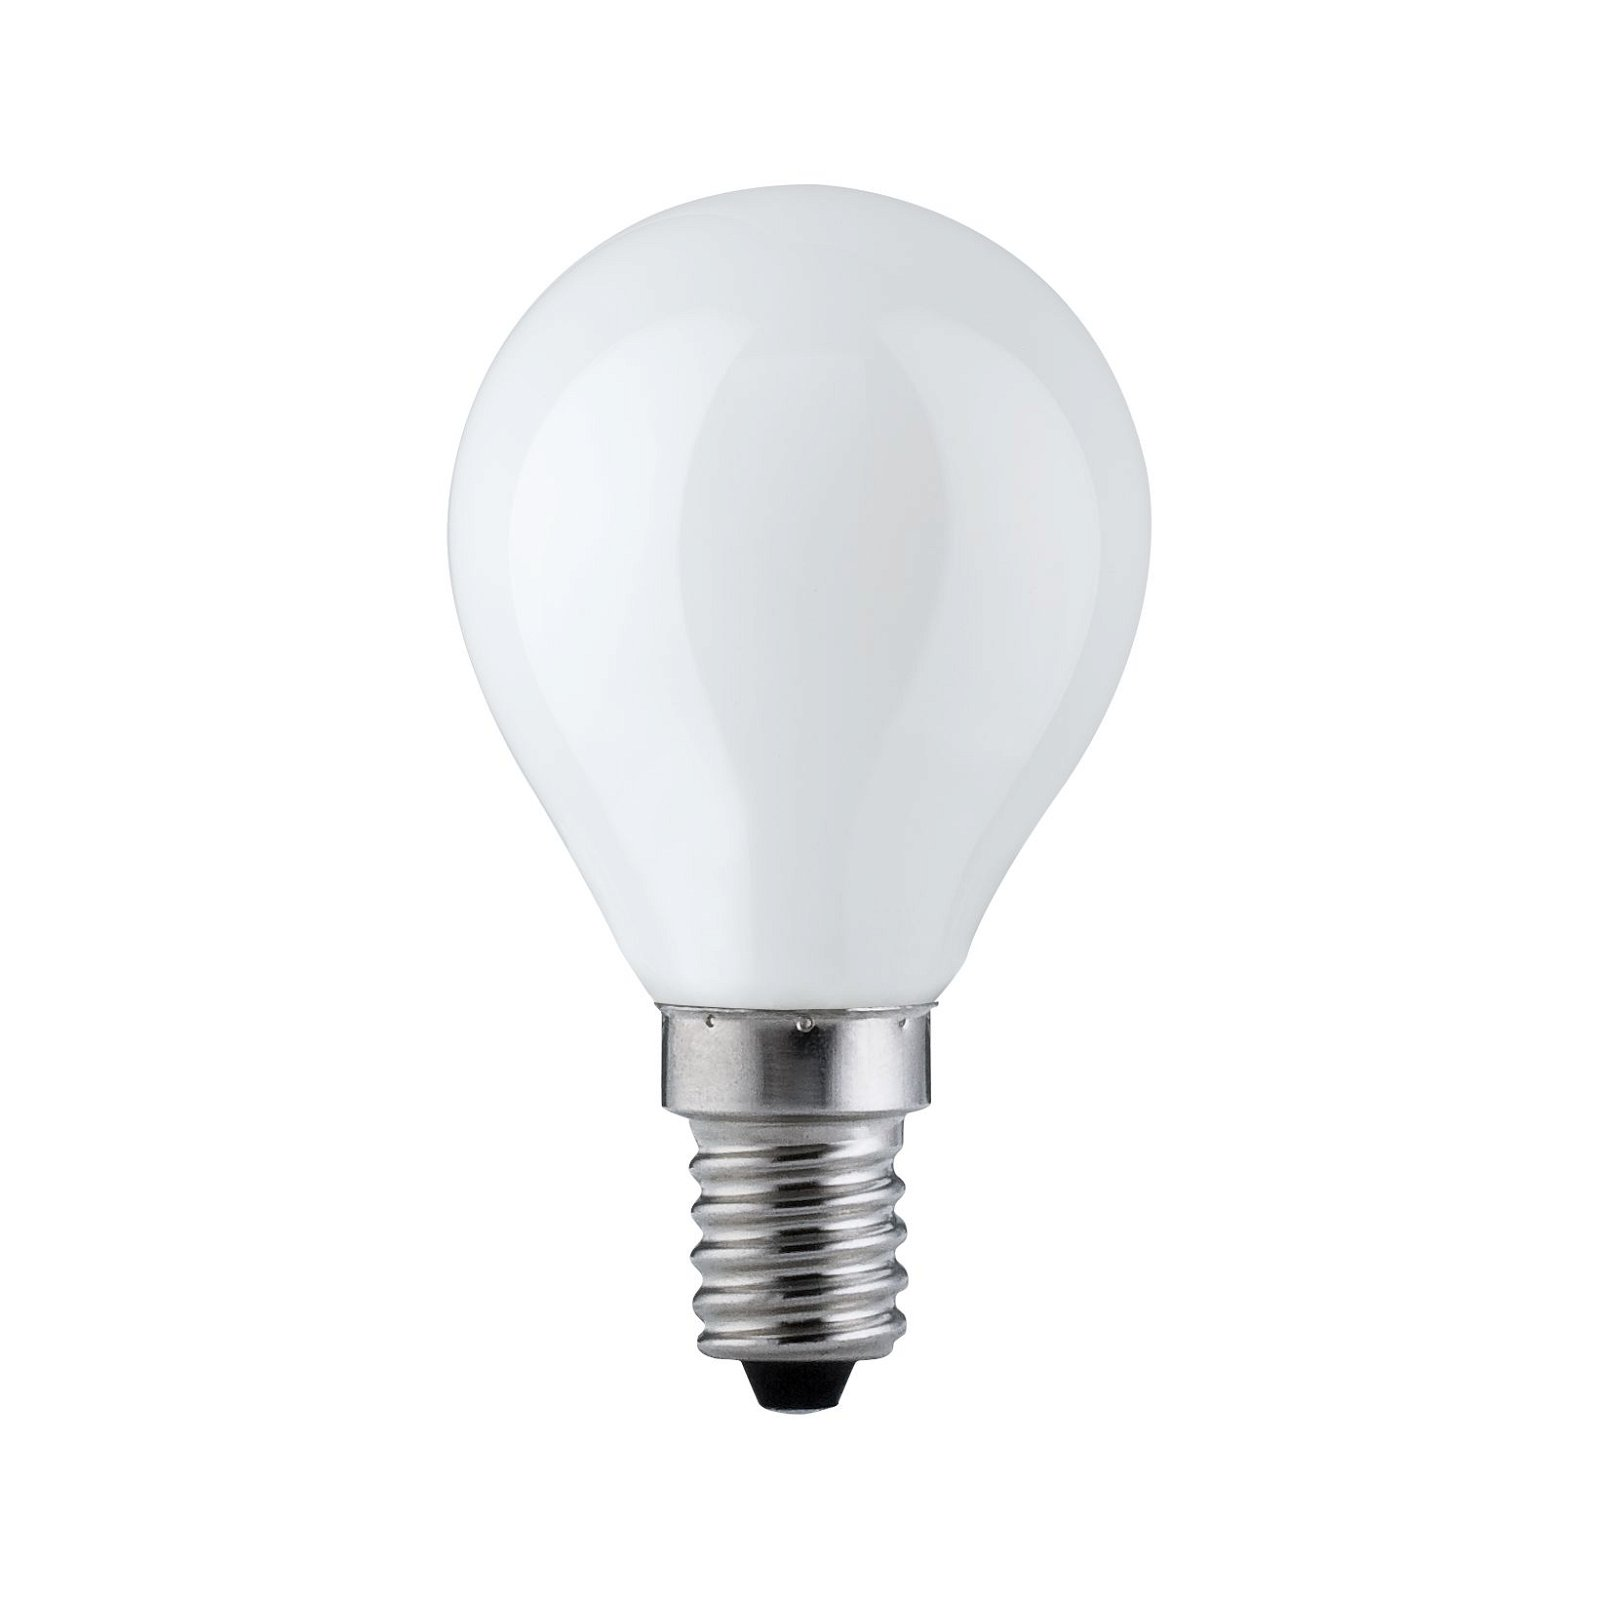 Glühbirne Backofenlampe 300° E14 230V 300lm 40W 2700K 300°/Opal